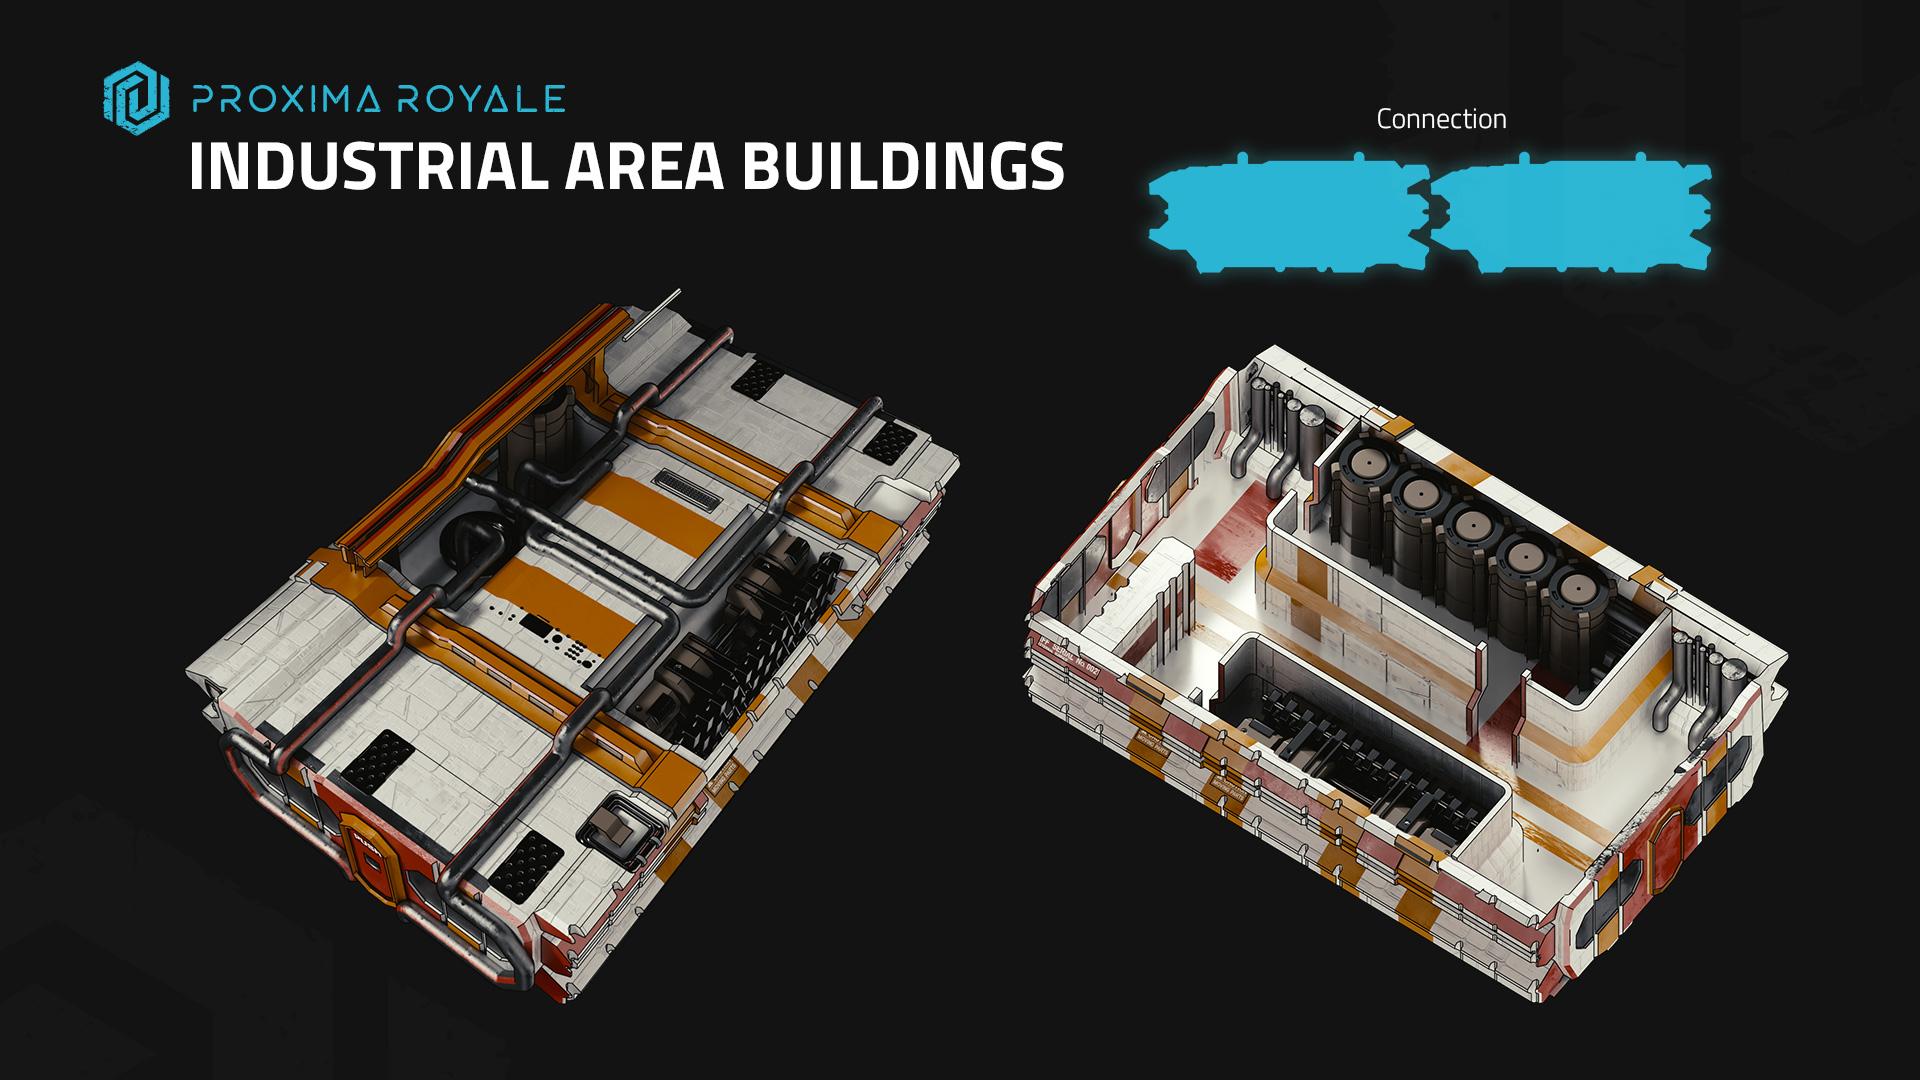 2 industrial area buildings 3